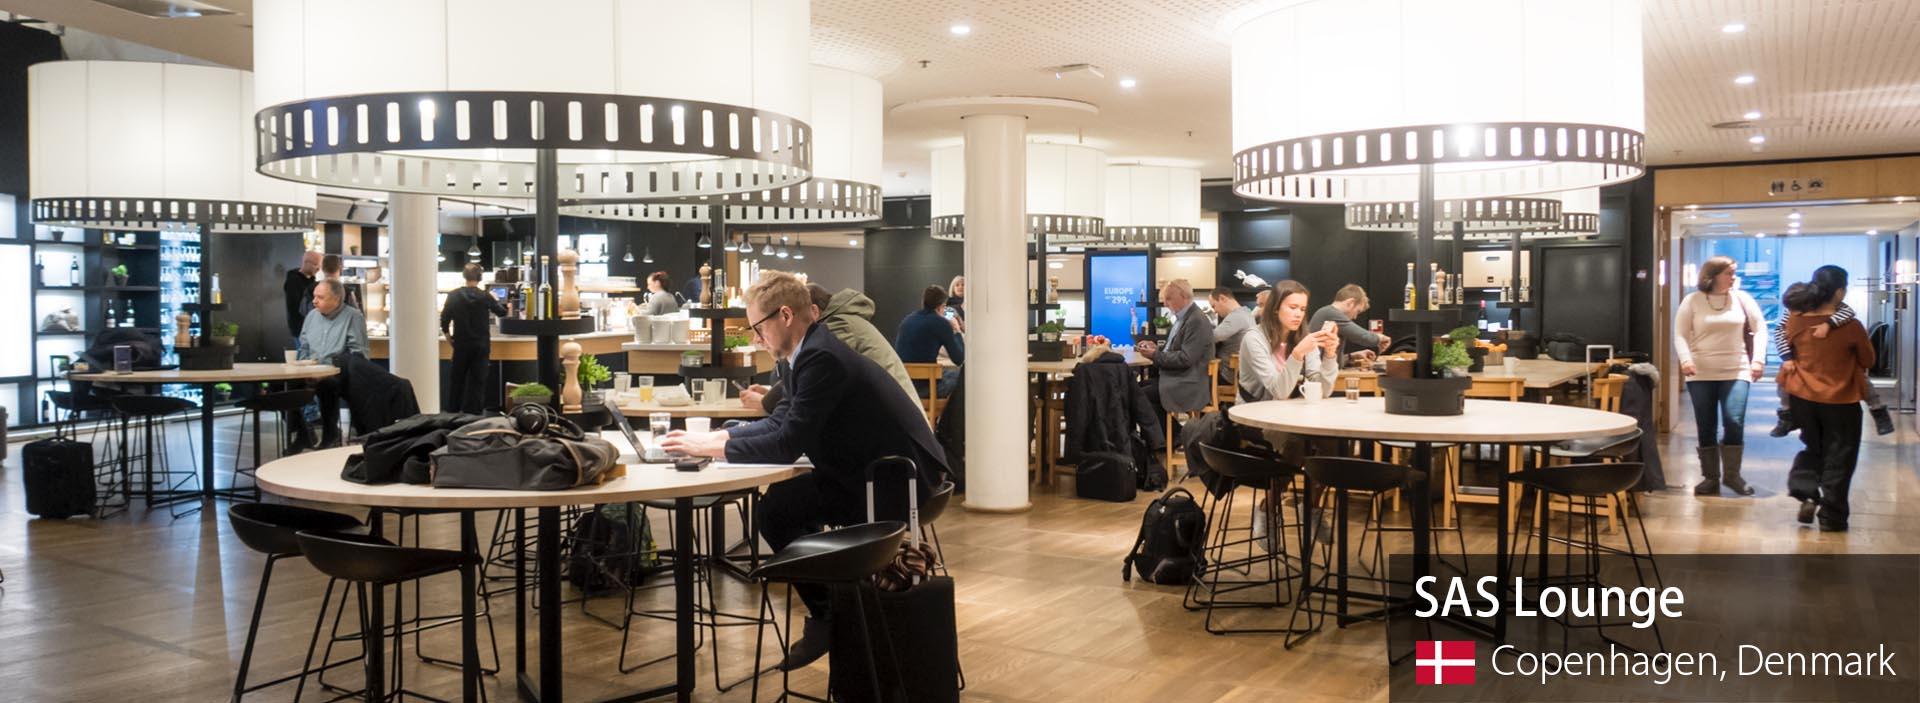 Review: SAS Business Class Lounge at Copenhagen Kastrup